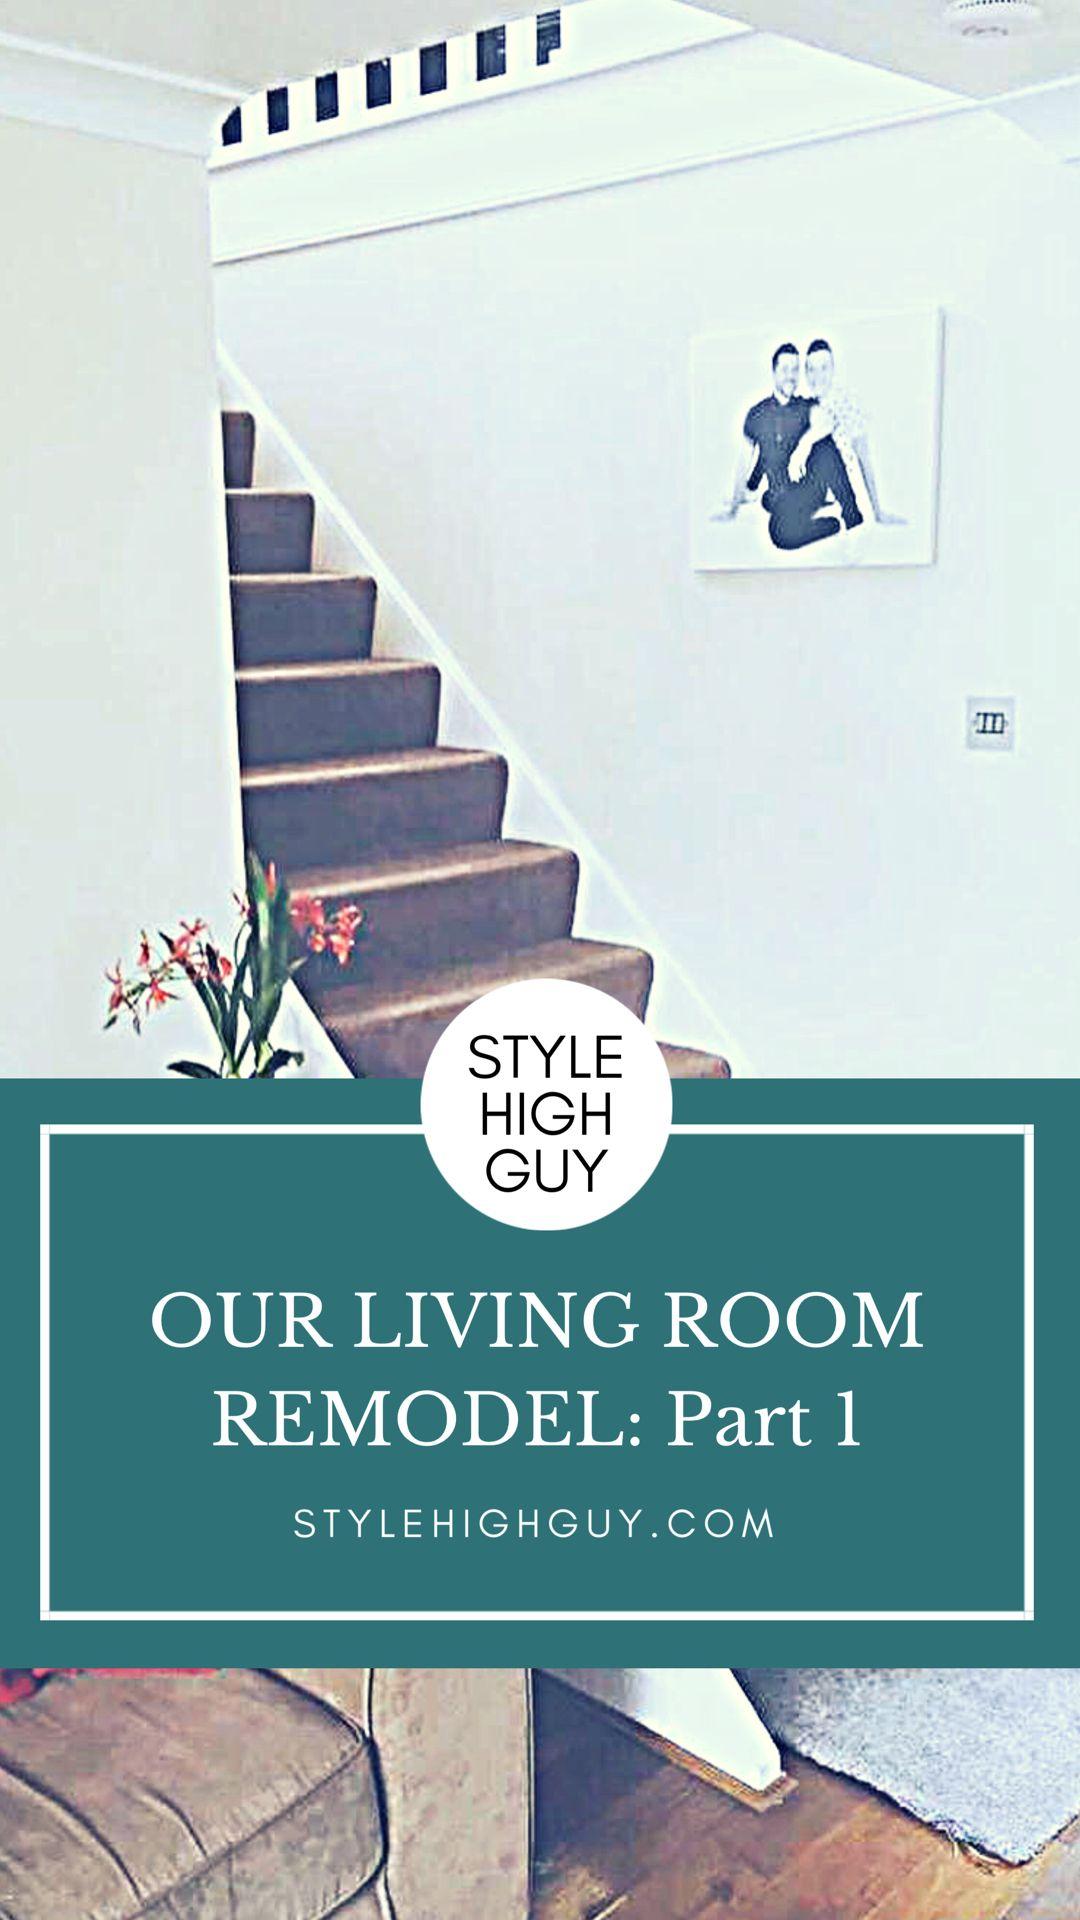 Living Room Remodel Renovation | Diy renovation, Home diy ...